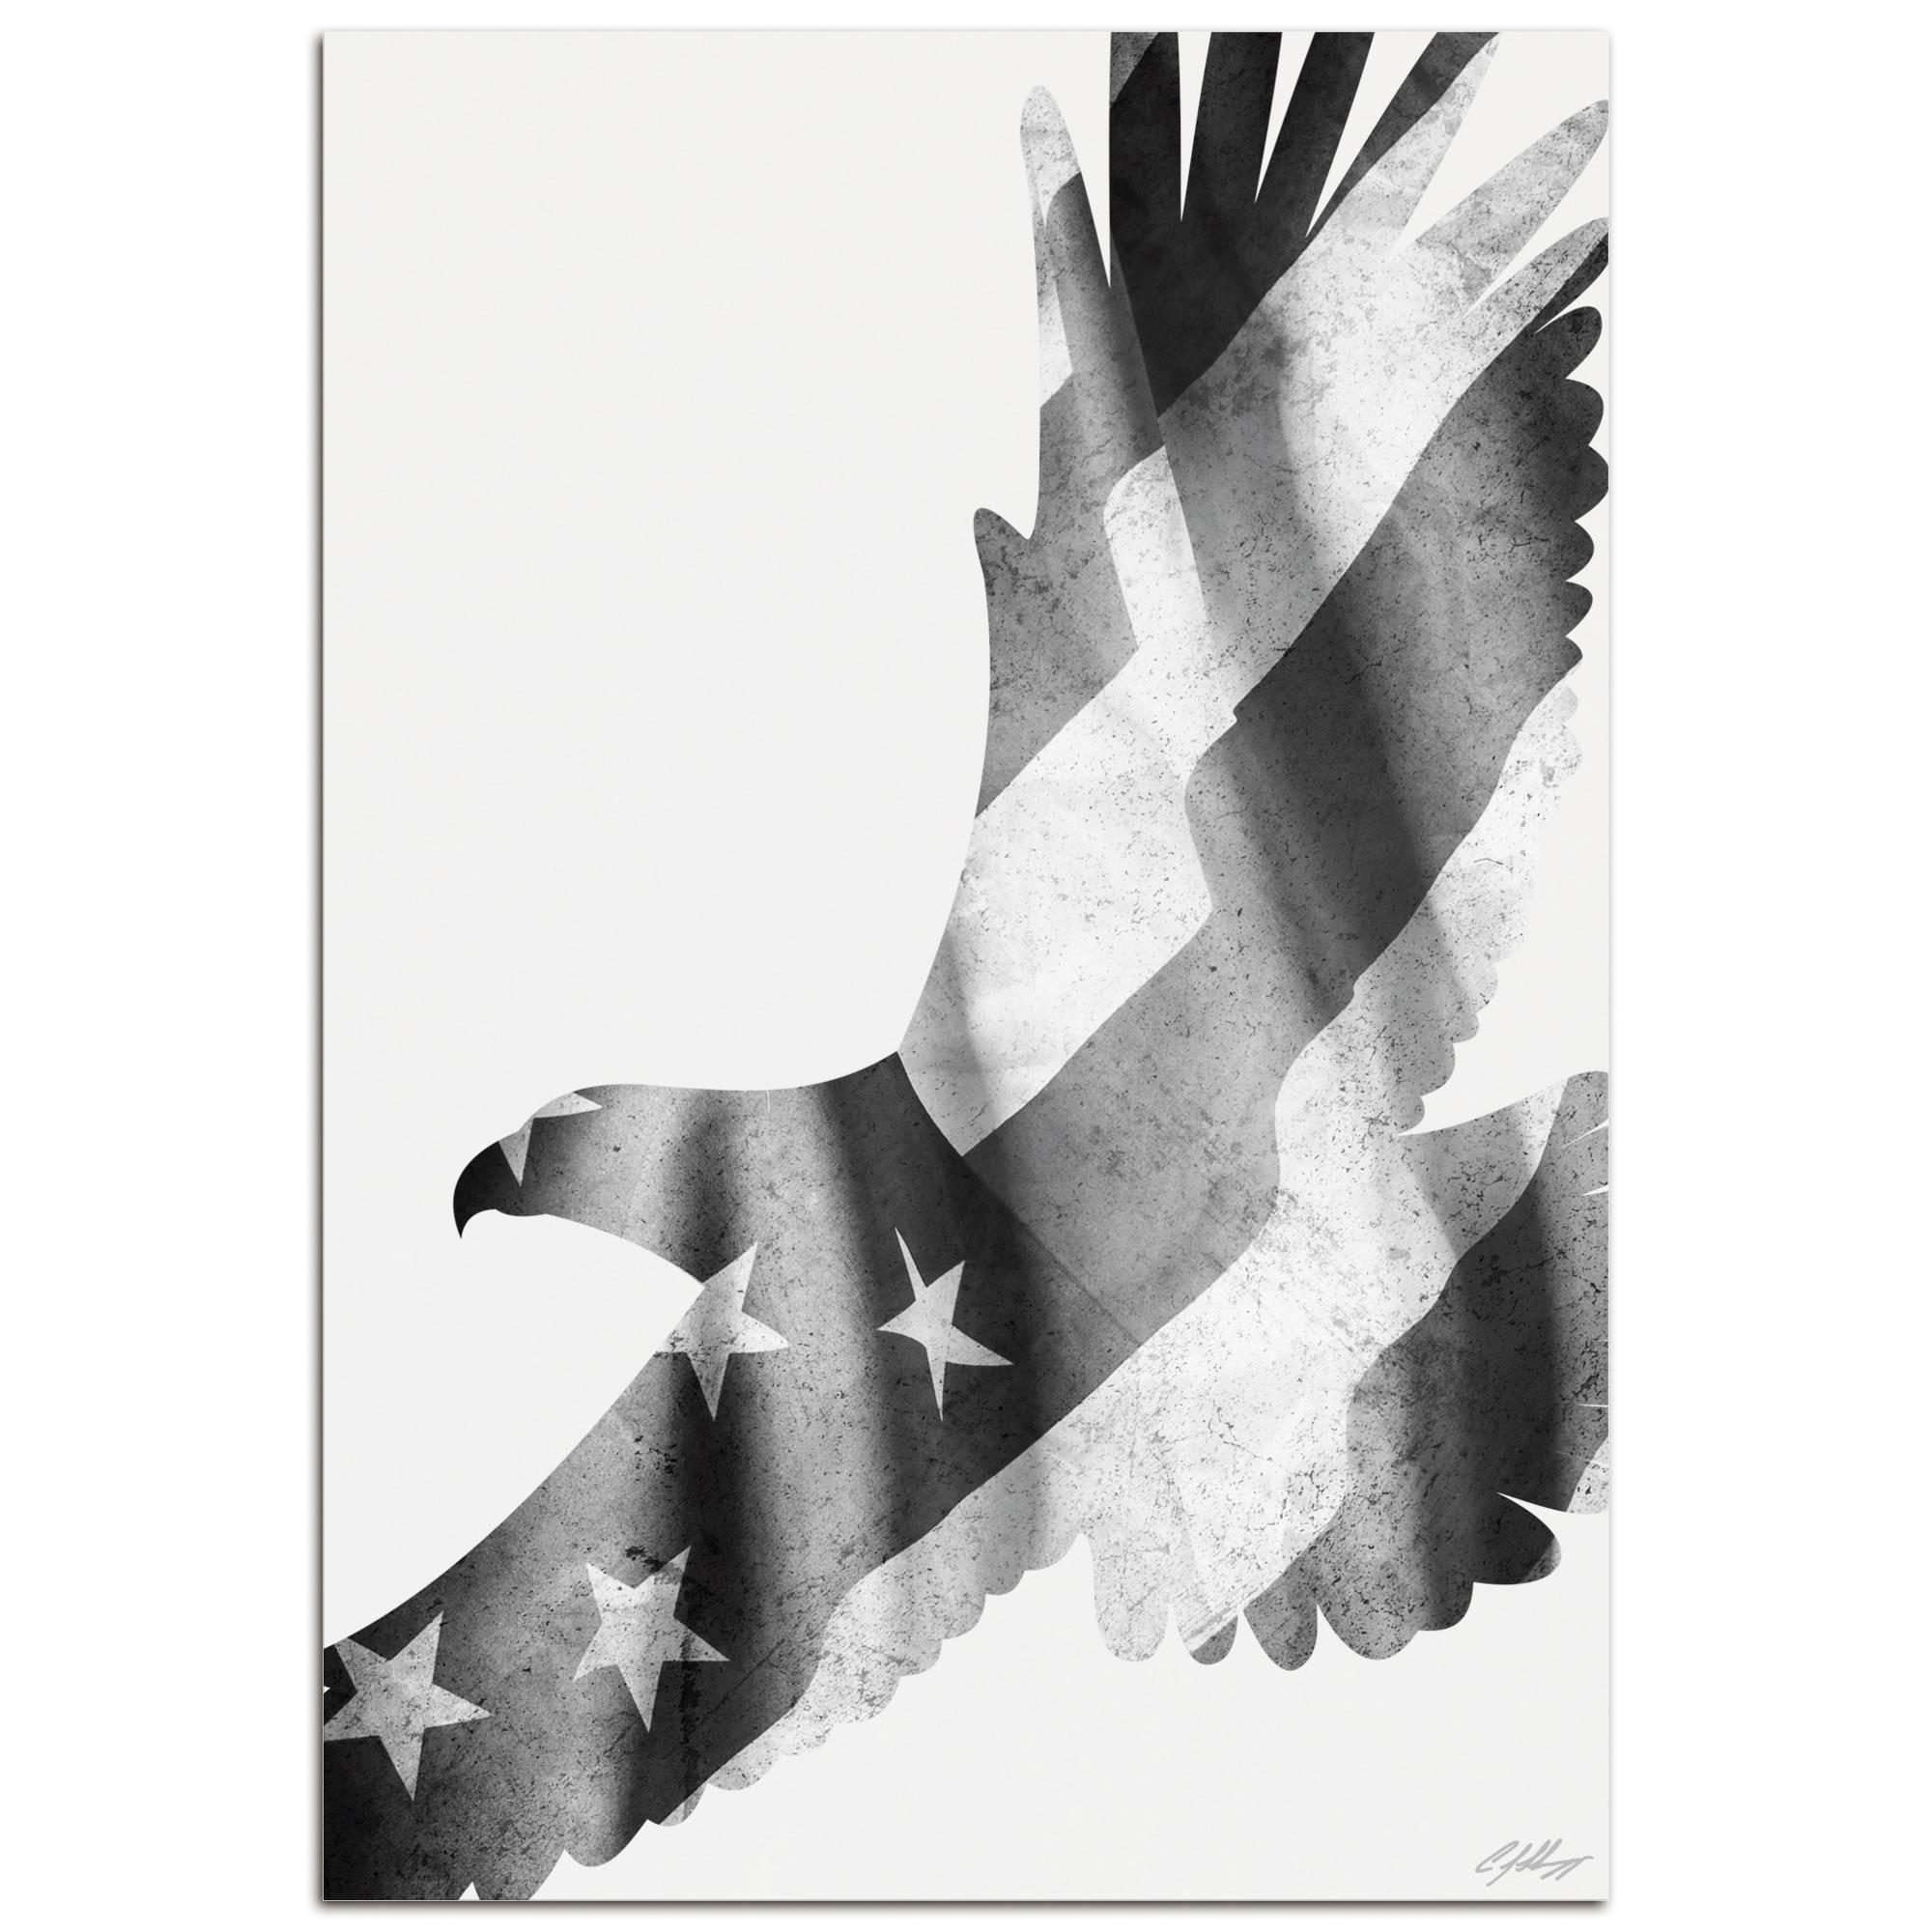 FREEDOM EAGLE BLACK & WHITE - 32x22 in. Metal US Flag Print